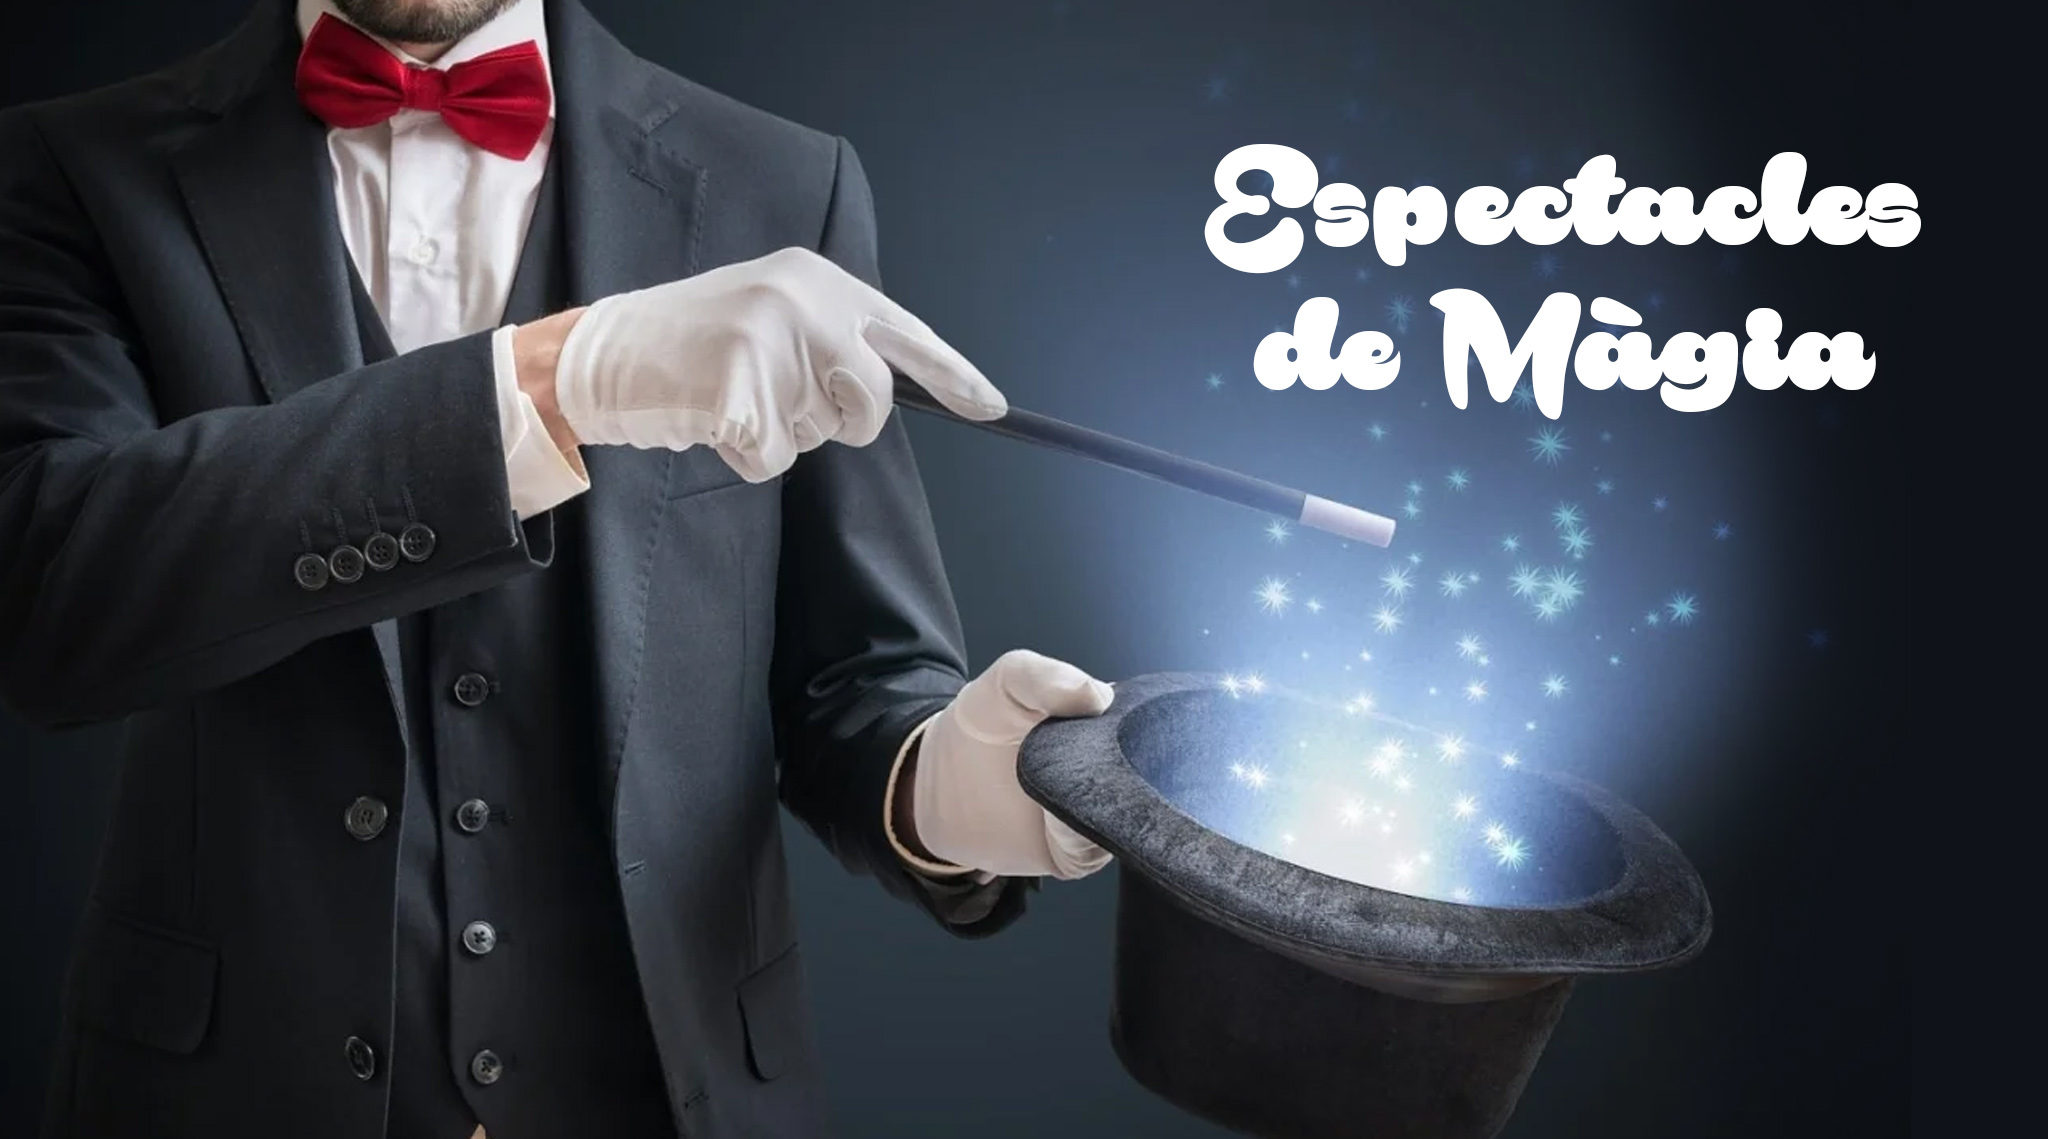 Espectacle de màgia